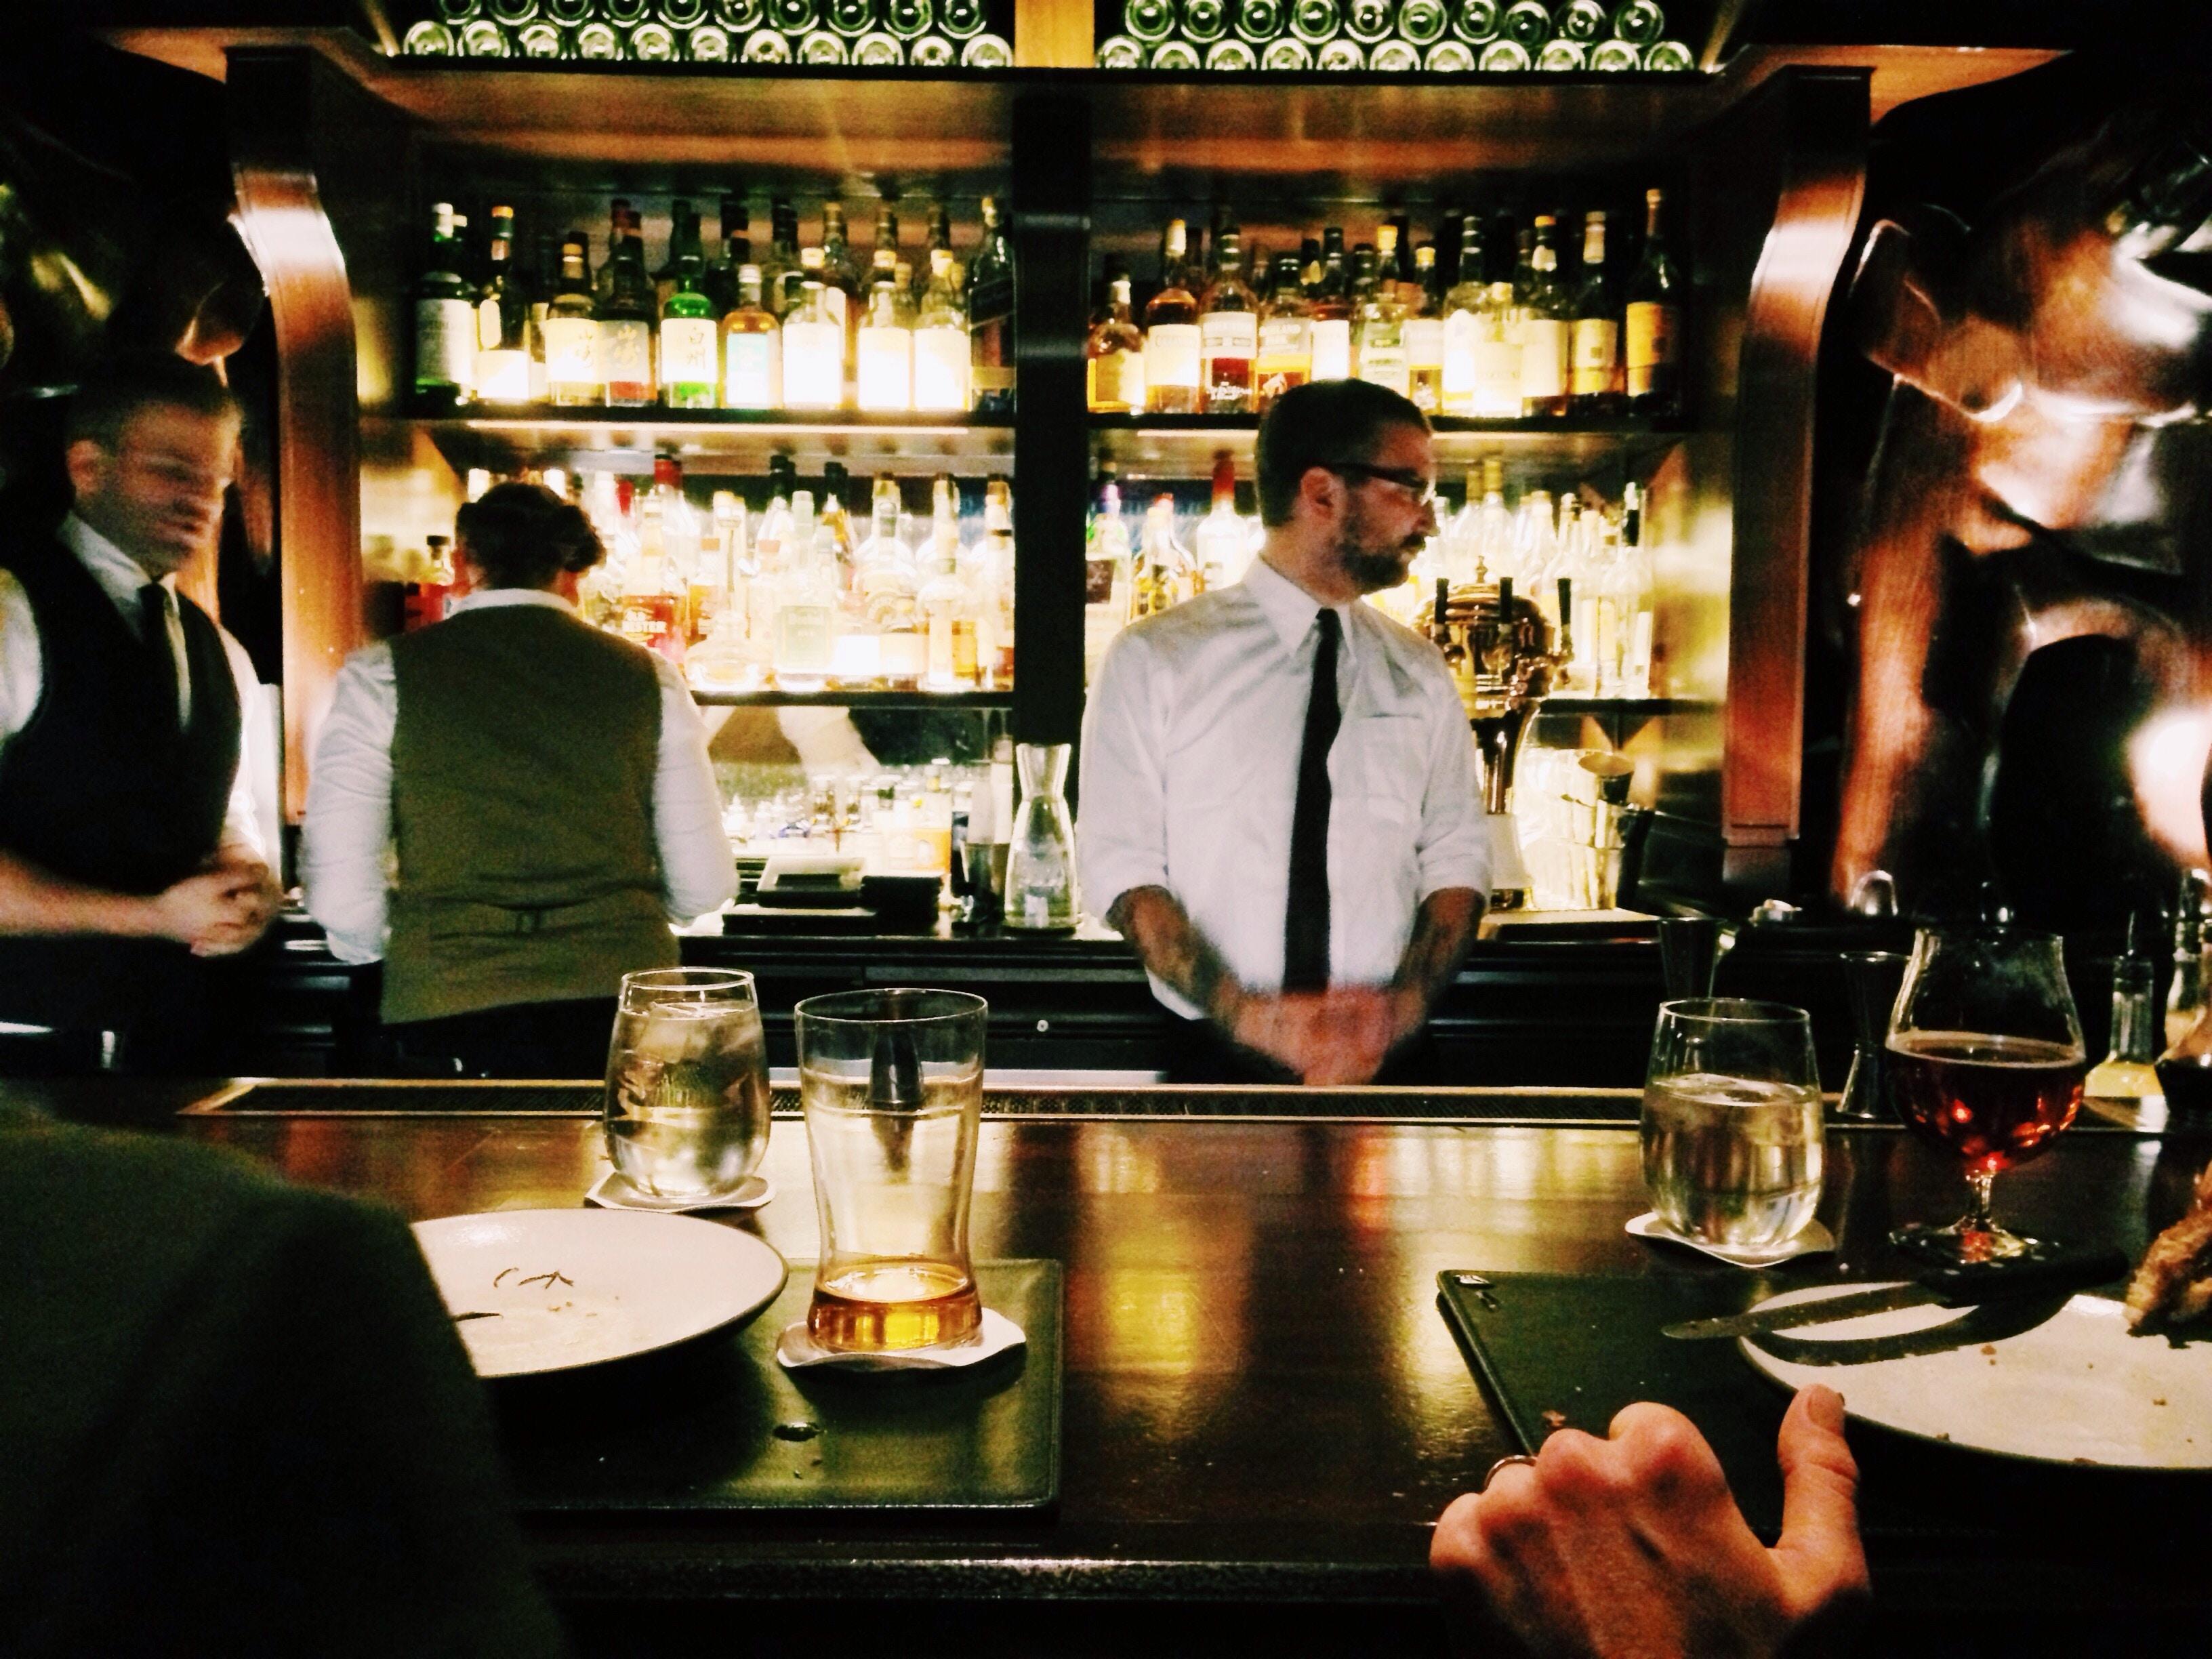 Bar | Photo: Unsplash/Taylor Davidson